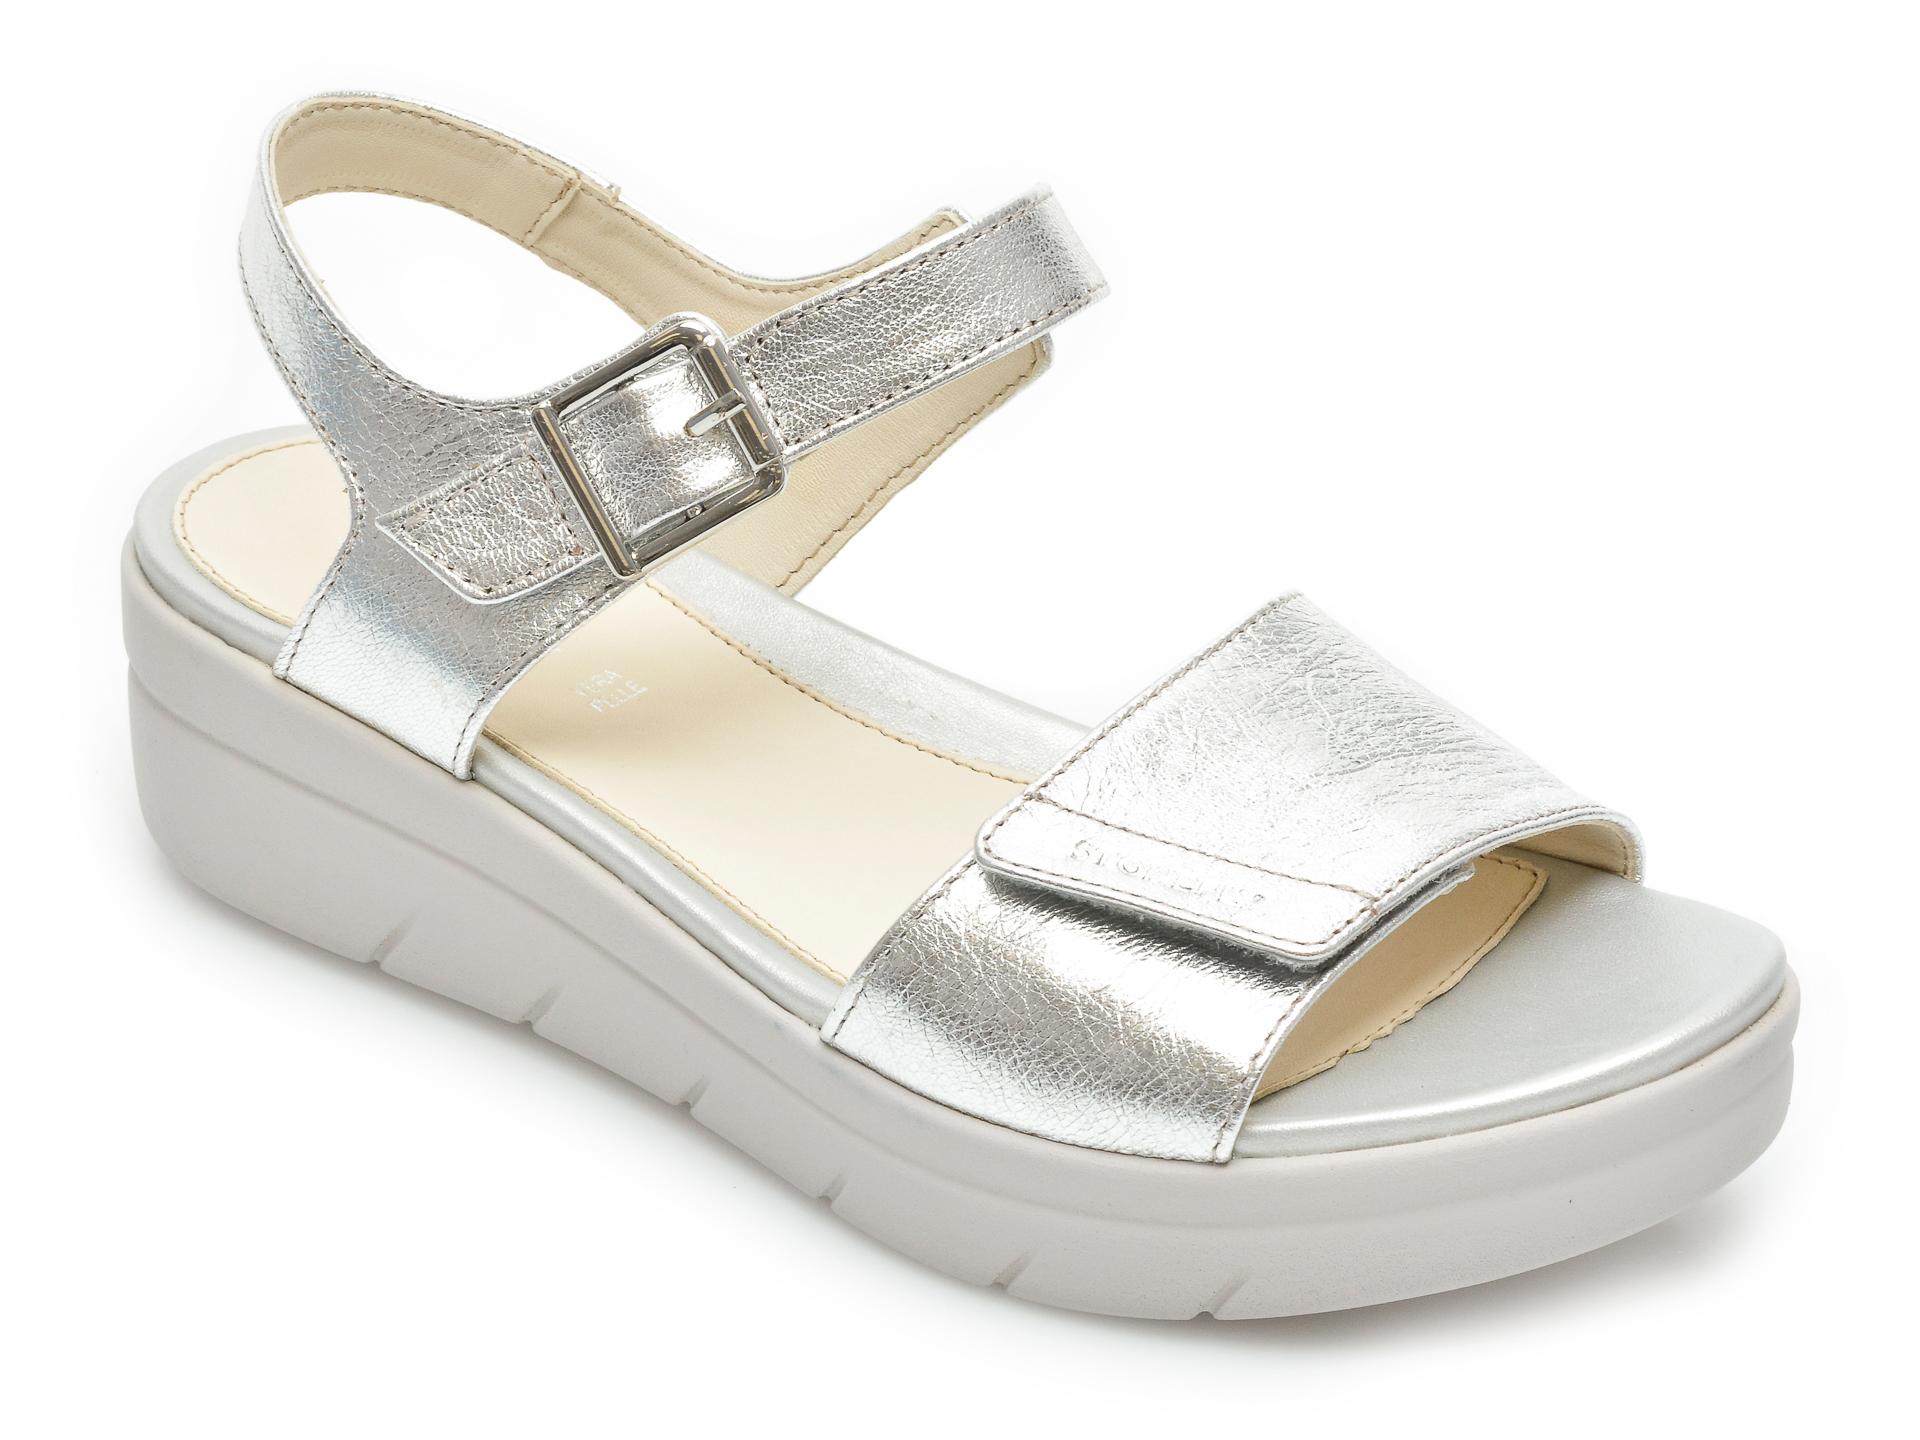 Sandale STONEFLY argintii, Aquii2, din piele naturala